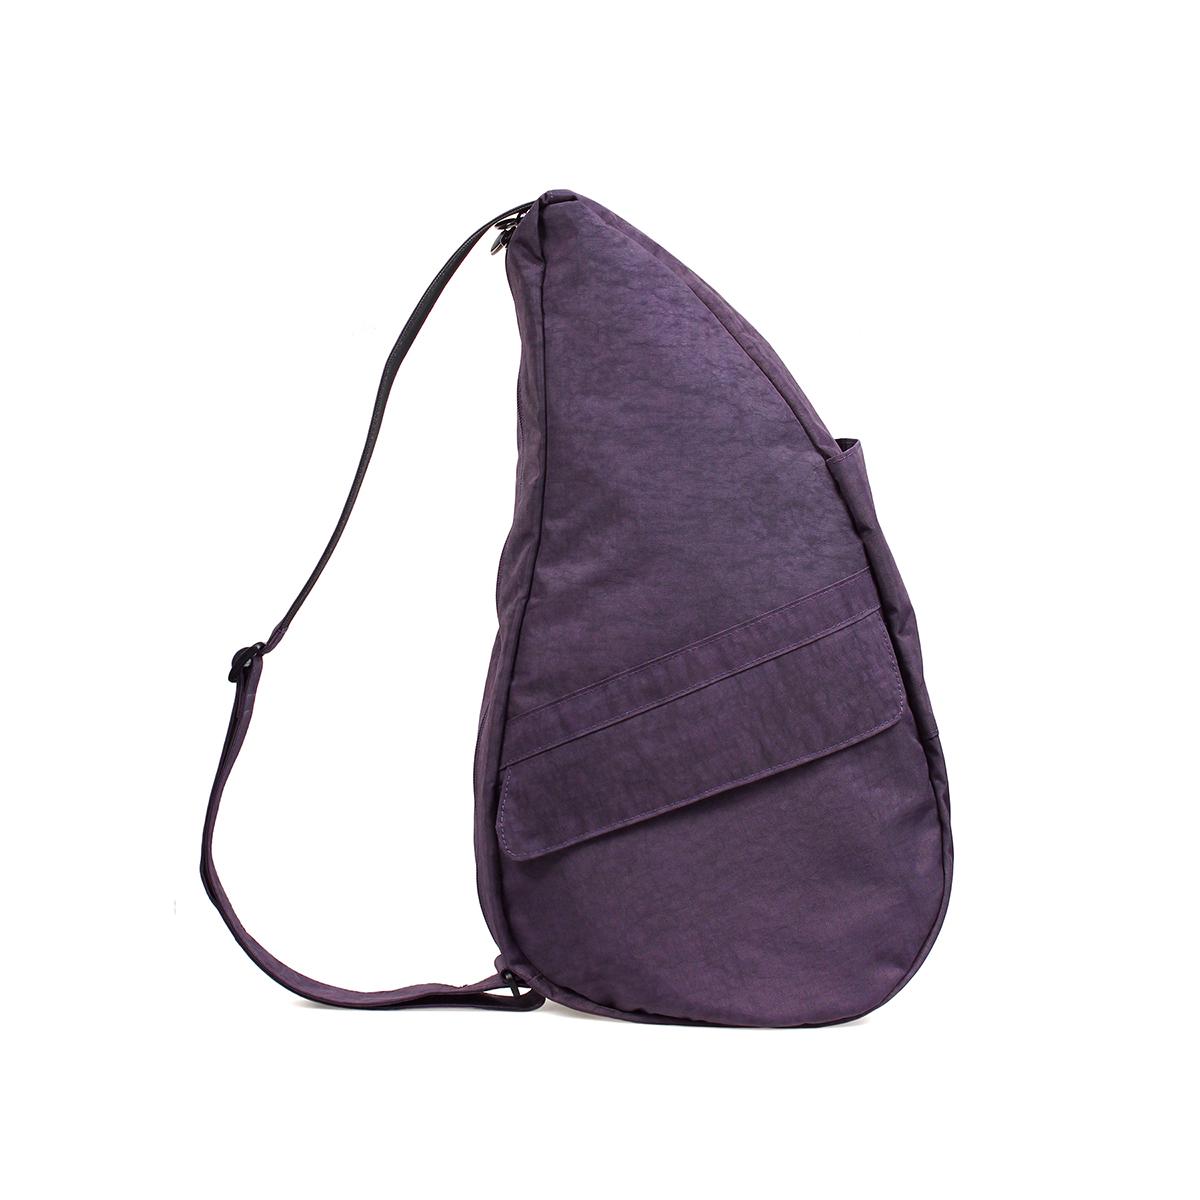 Healthy Back Bag/ヘルシーバックバッグ/ショルダーバッグ/ボディバッグ/旅行バッグ/軽量/レディース/メンズ 《限定ポーチ付》 公式ストア ヘルシーバックバッグ テクスチャードナイロン Mサイズ プラム